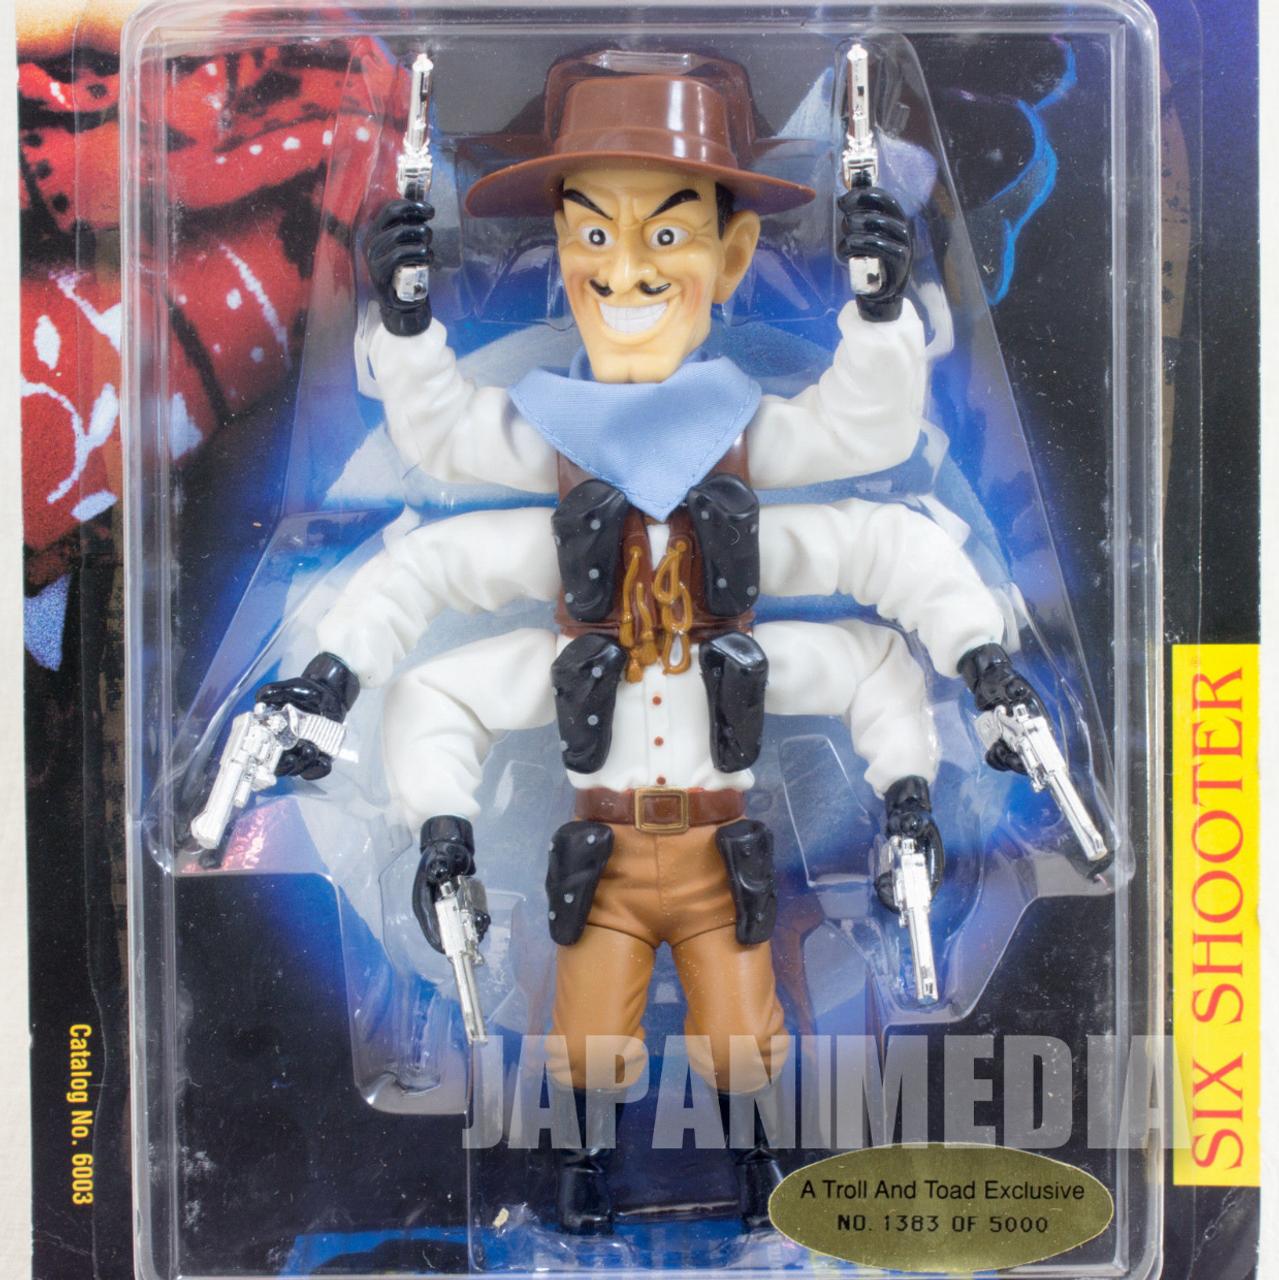 Puppet Master Six Shooter 5000 Limited Edition Model Full Moon Toys Medicom Toy